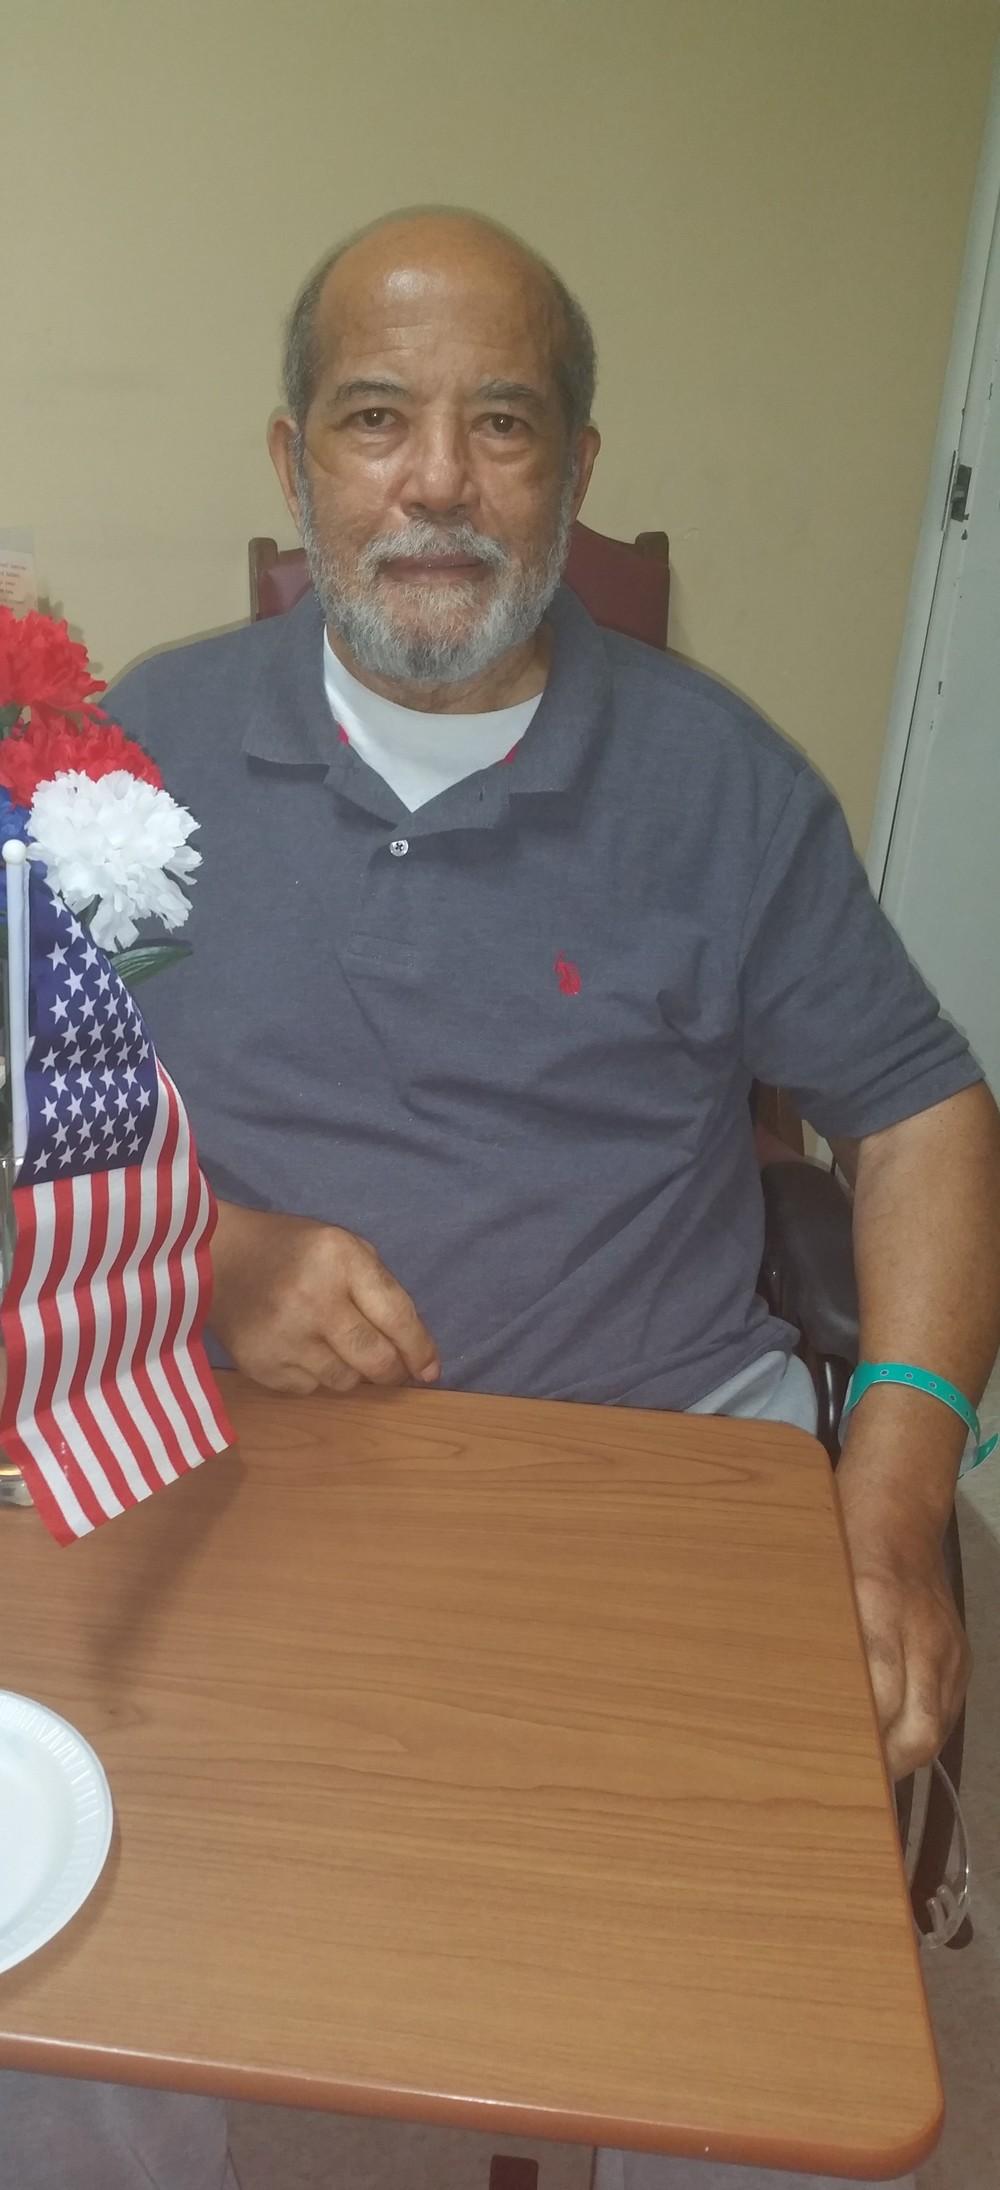 Our Vietnam veteran, Mr. John Sullivan, is ready to enjoy the day